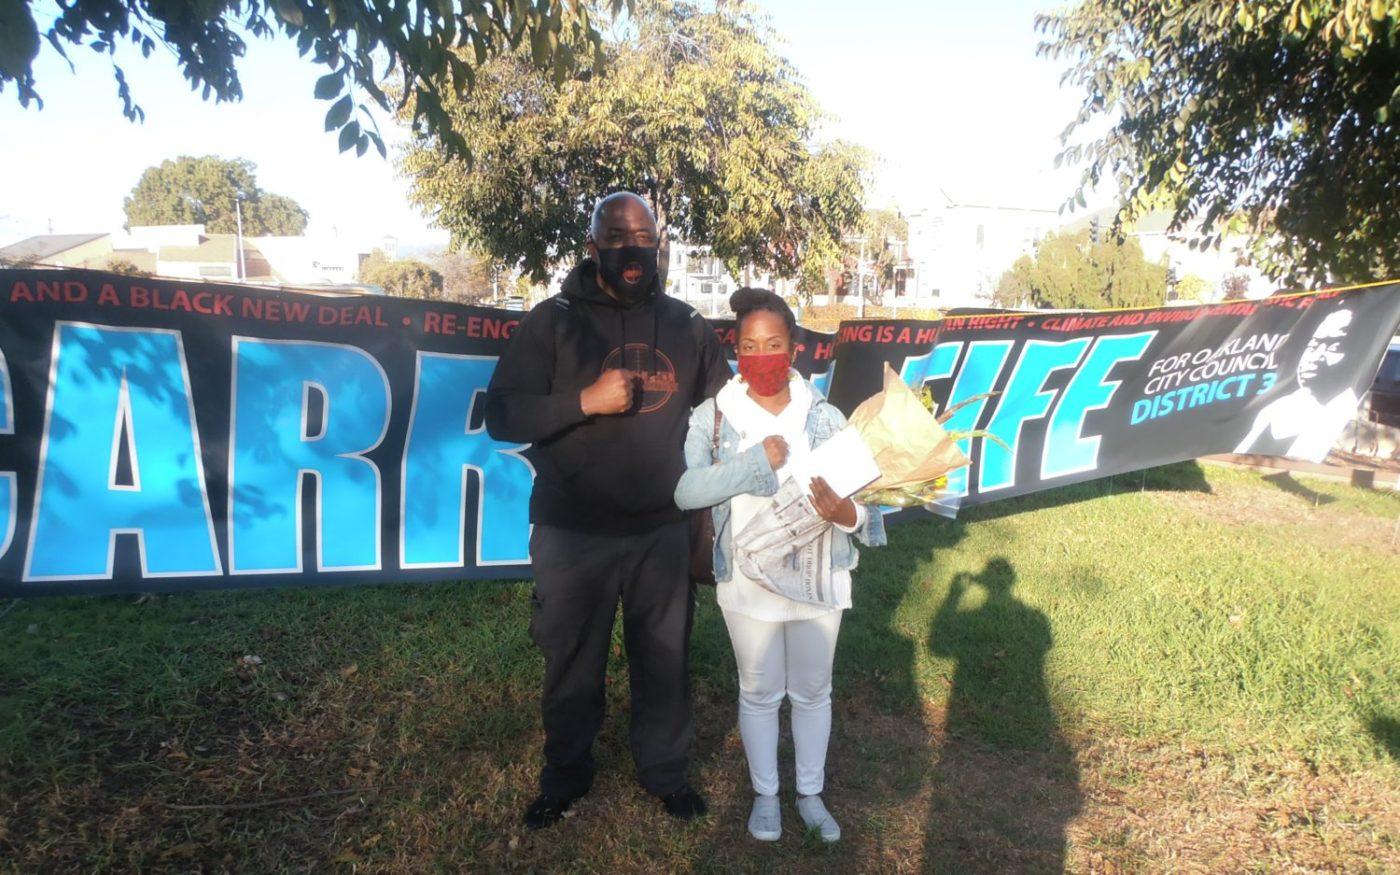 Organizers-supreme-Tur-Ha-Ak-Carroll-Fife-Third-District-Oakland-Jahahara-1400x875, Urgent appeal to President Trump, World News & Views